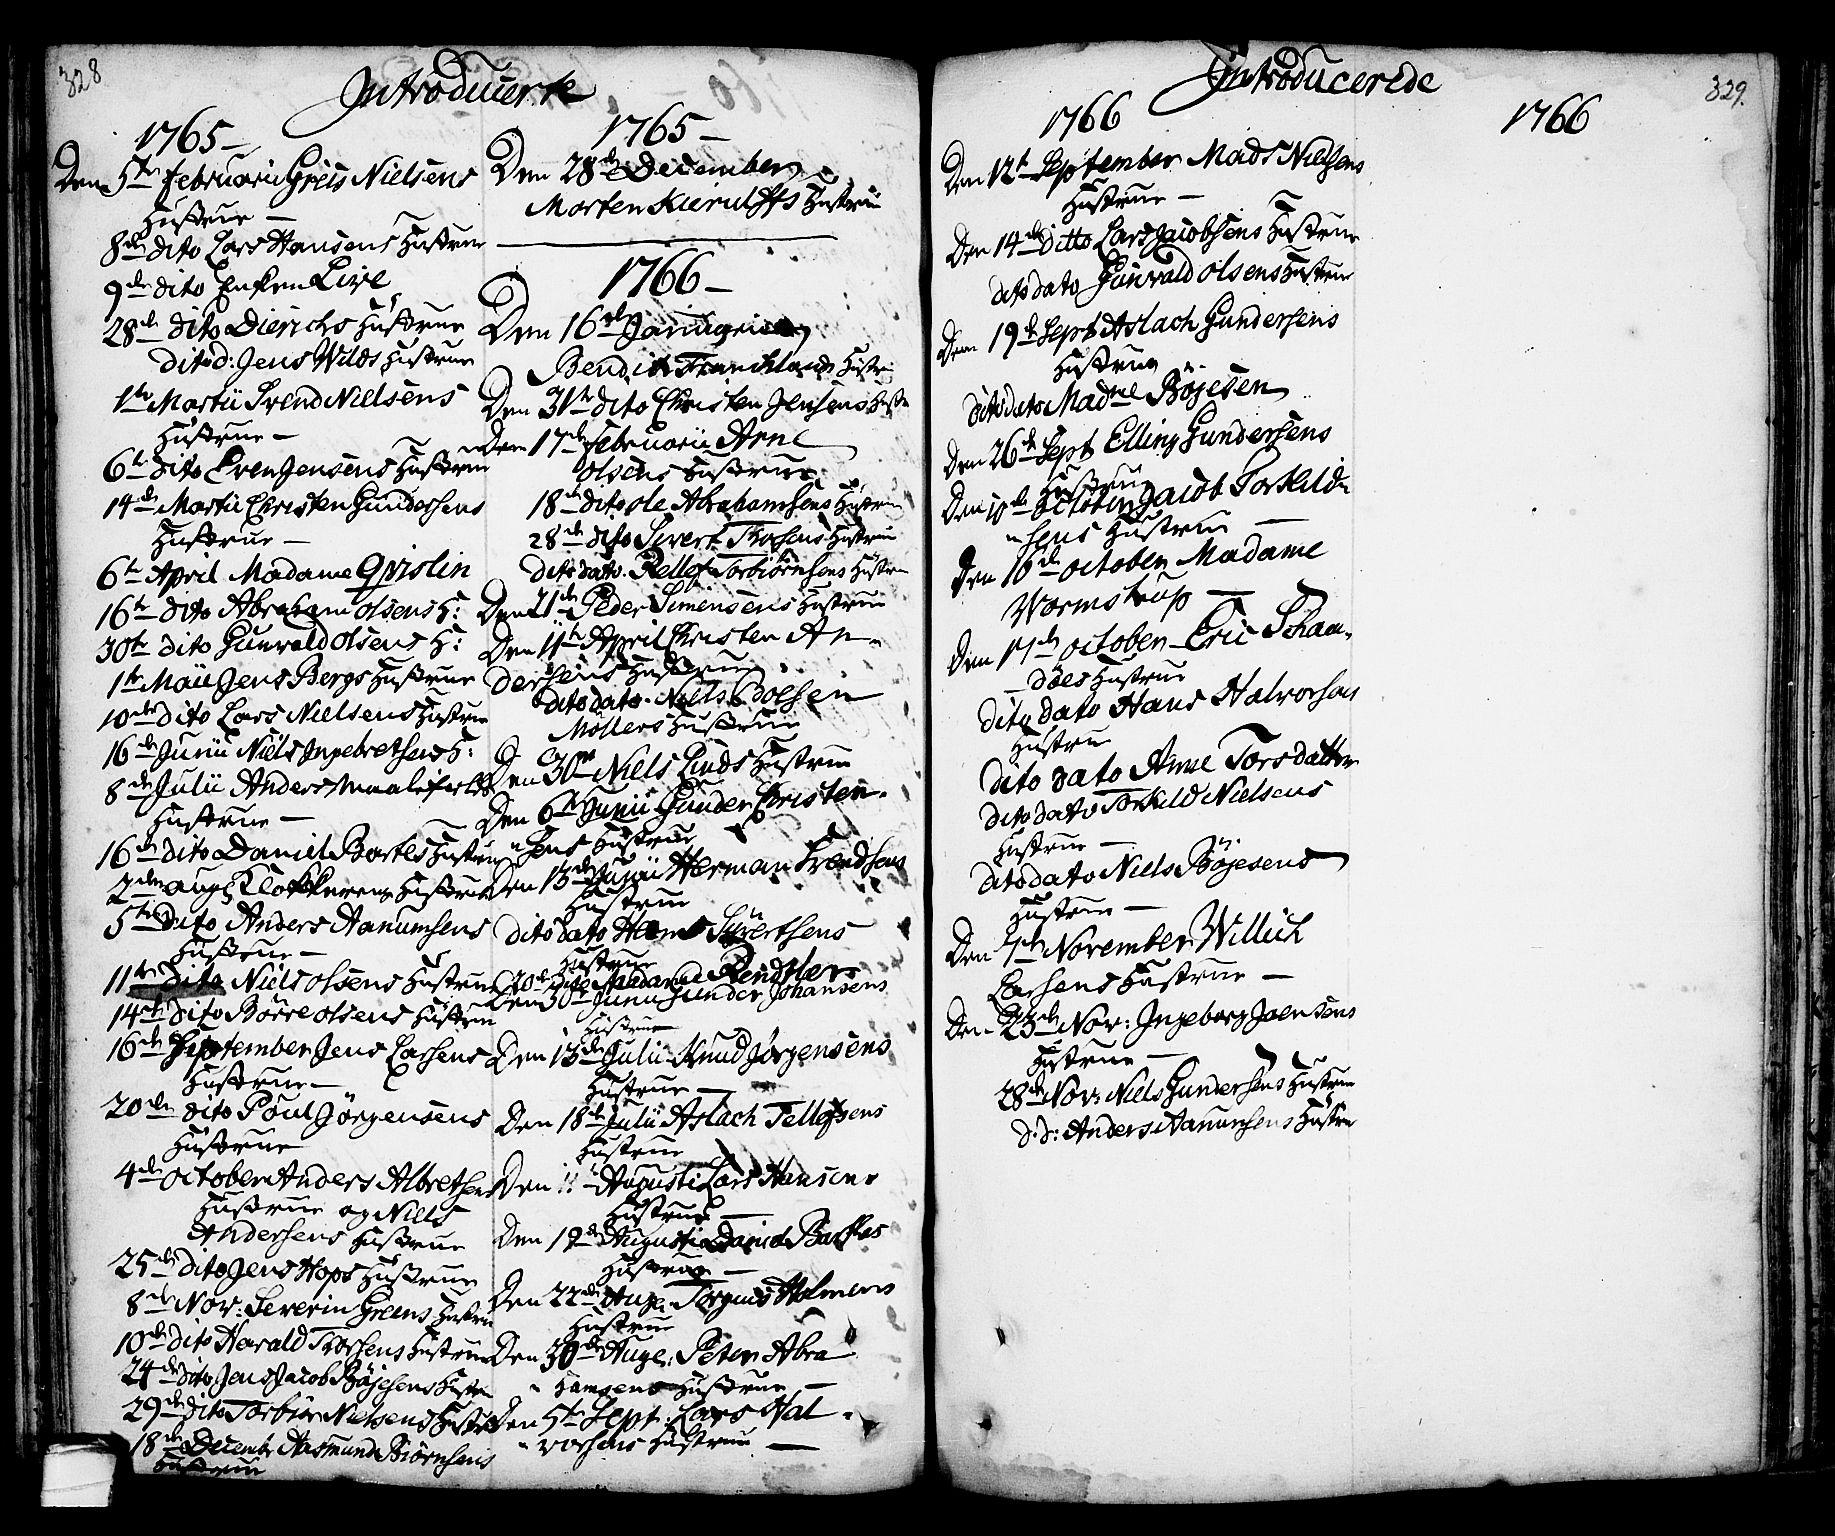 SAKO, Kragerø kirkebøker, F/Fa/L0001: Ministerialbok nr. 1, 1702-1766, s. 328-329